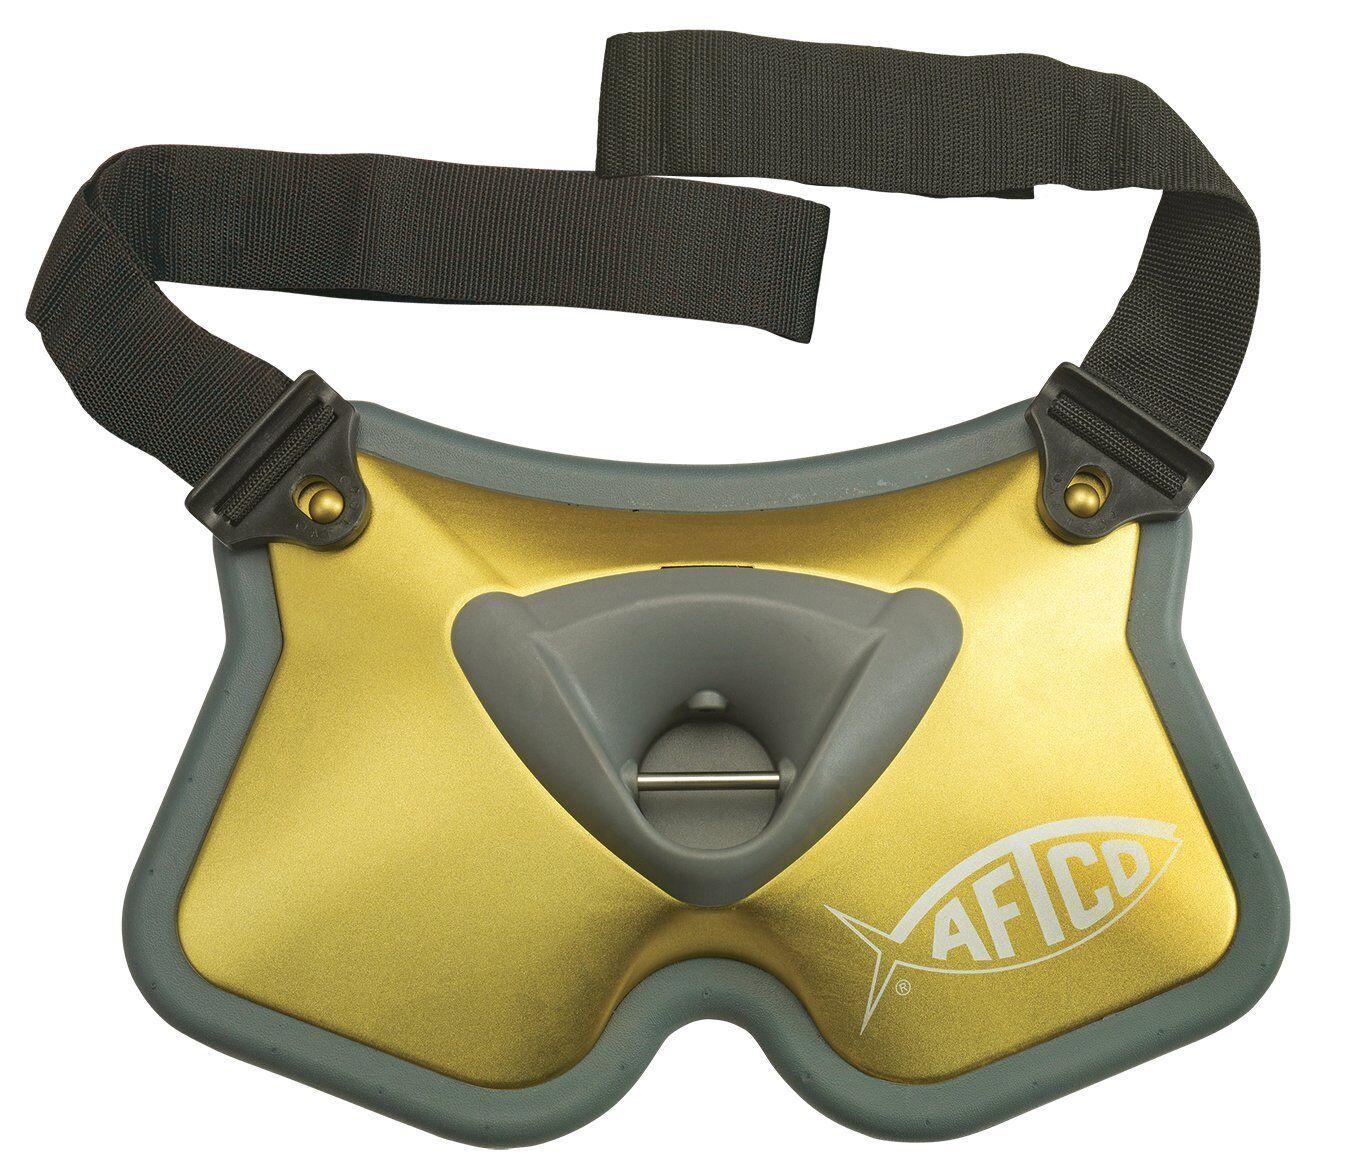 Aftco socorro lucha belt-Medium - 50-80 lb. trasto-AFB2-Envío Gratis